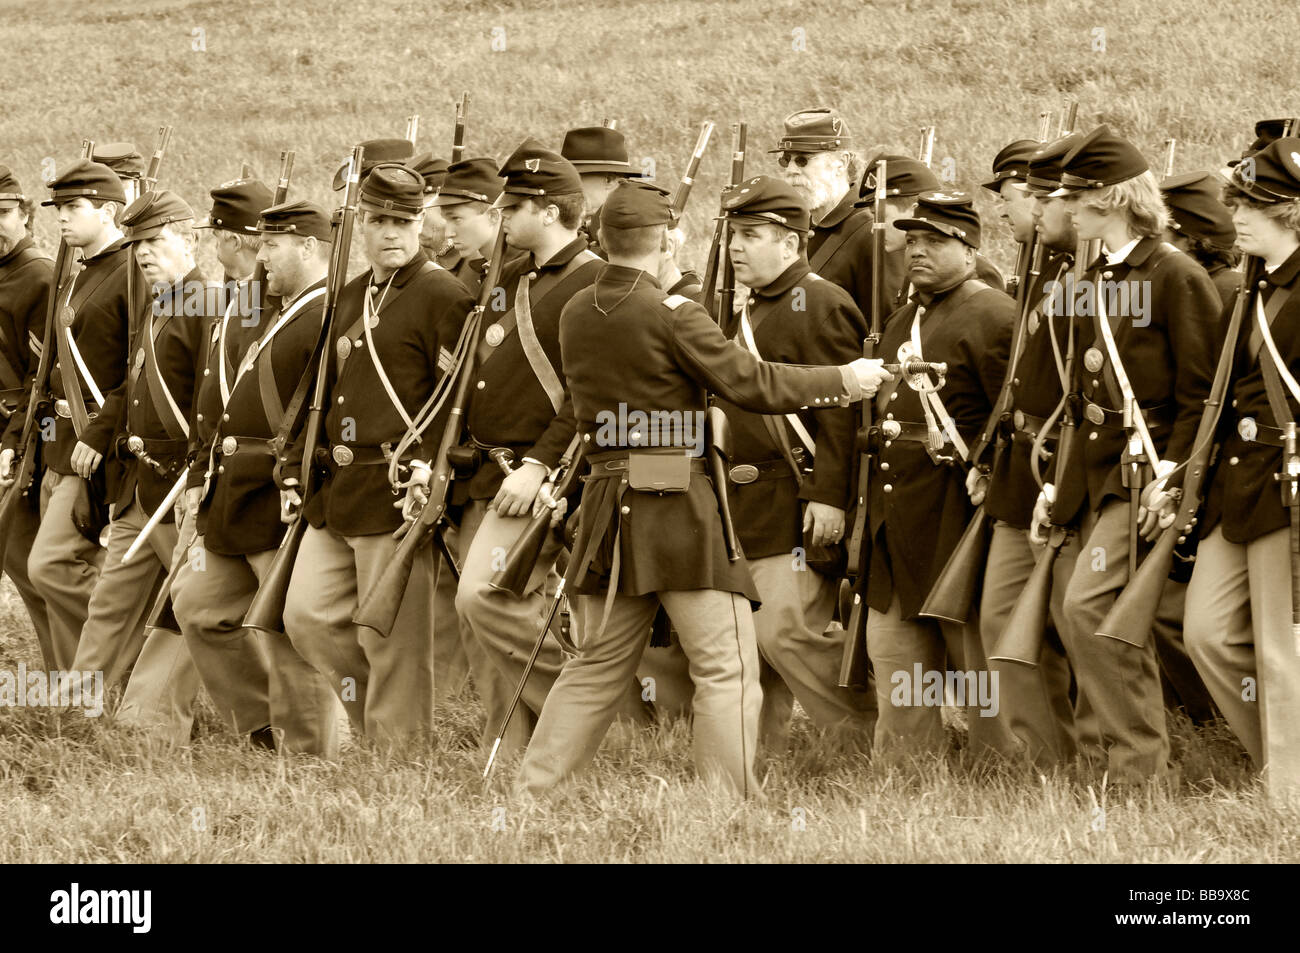 American Civil War - Union Troops - sepia tones - Stock Image